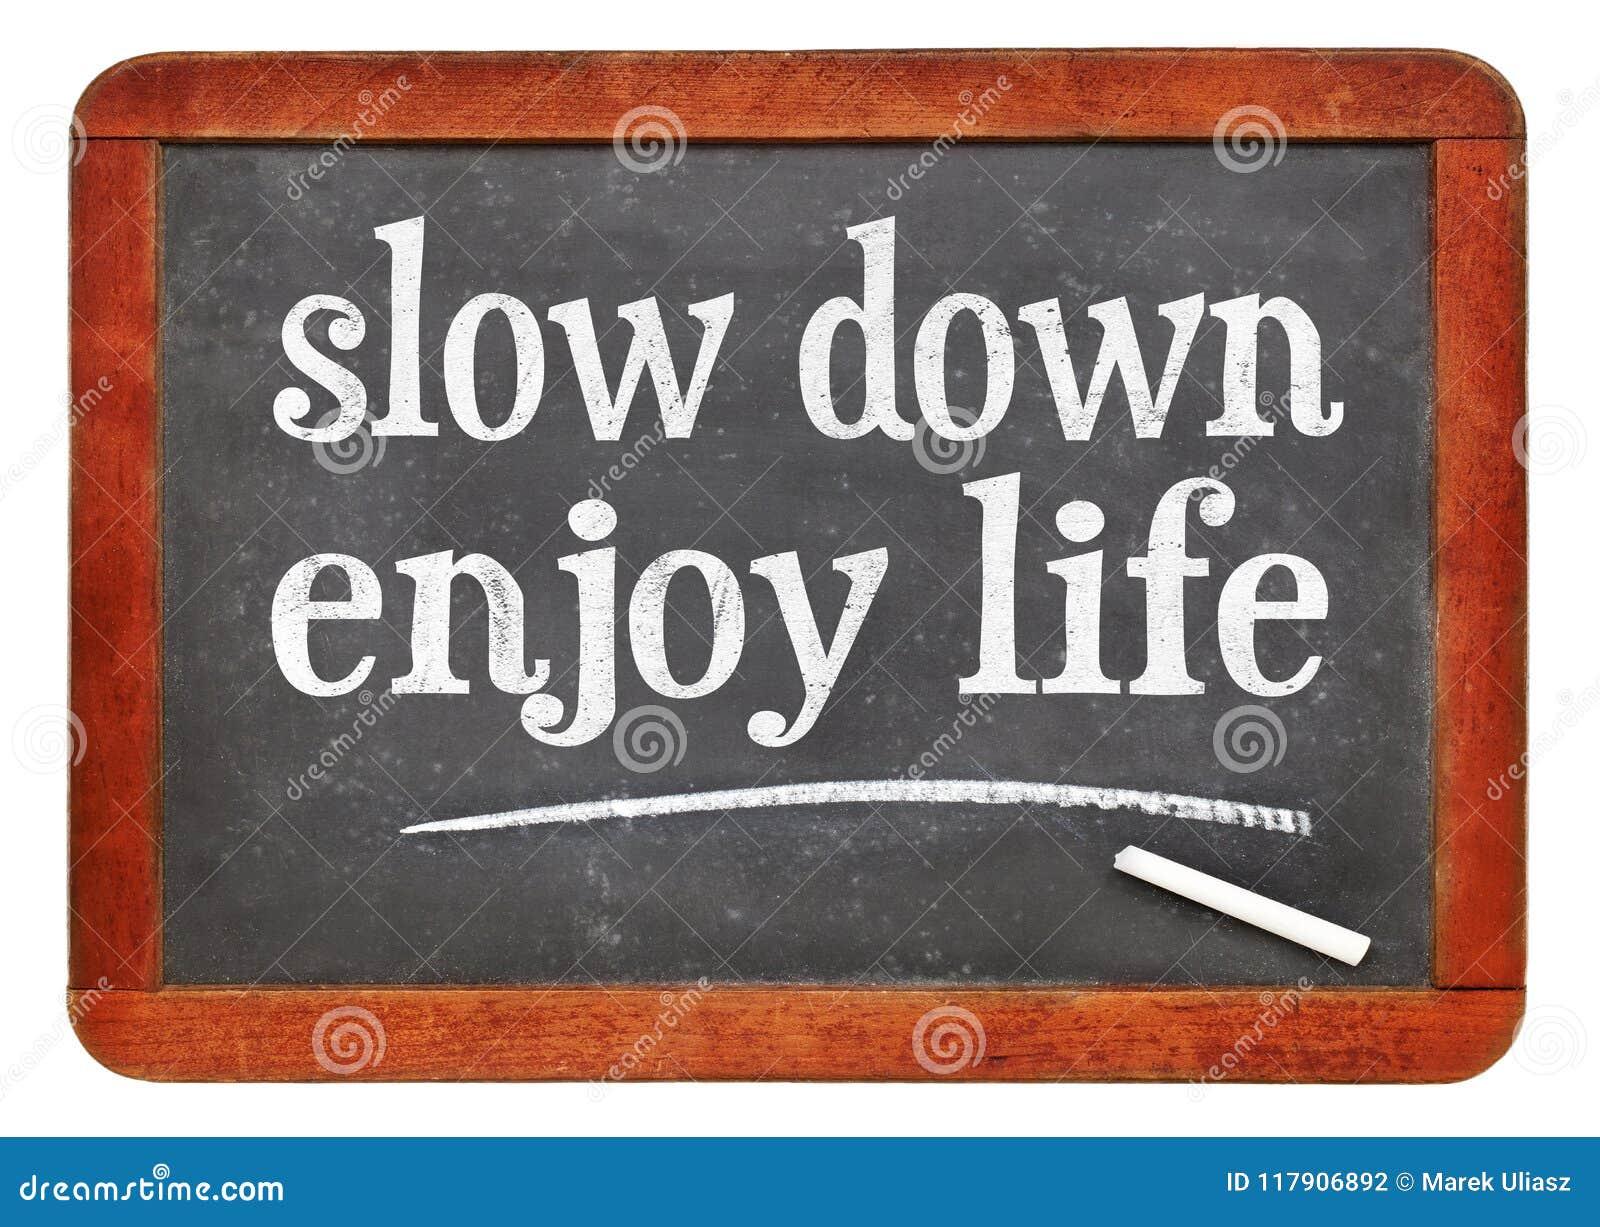 Slow down, enjoy life